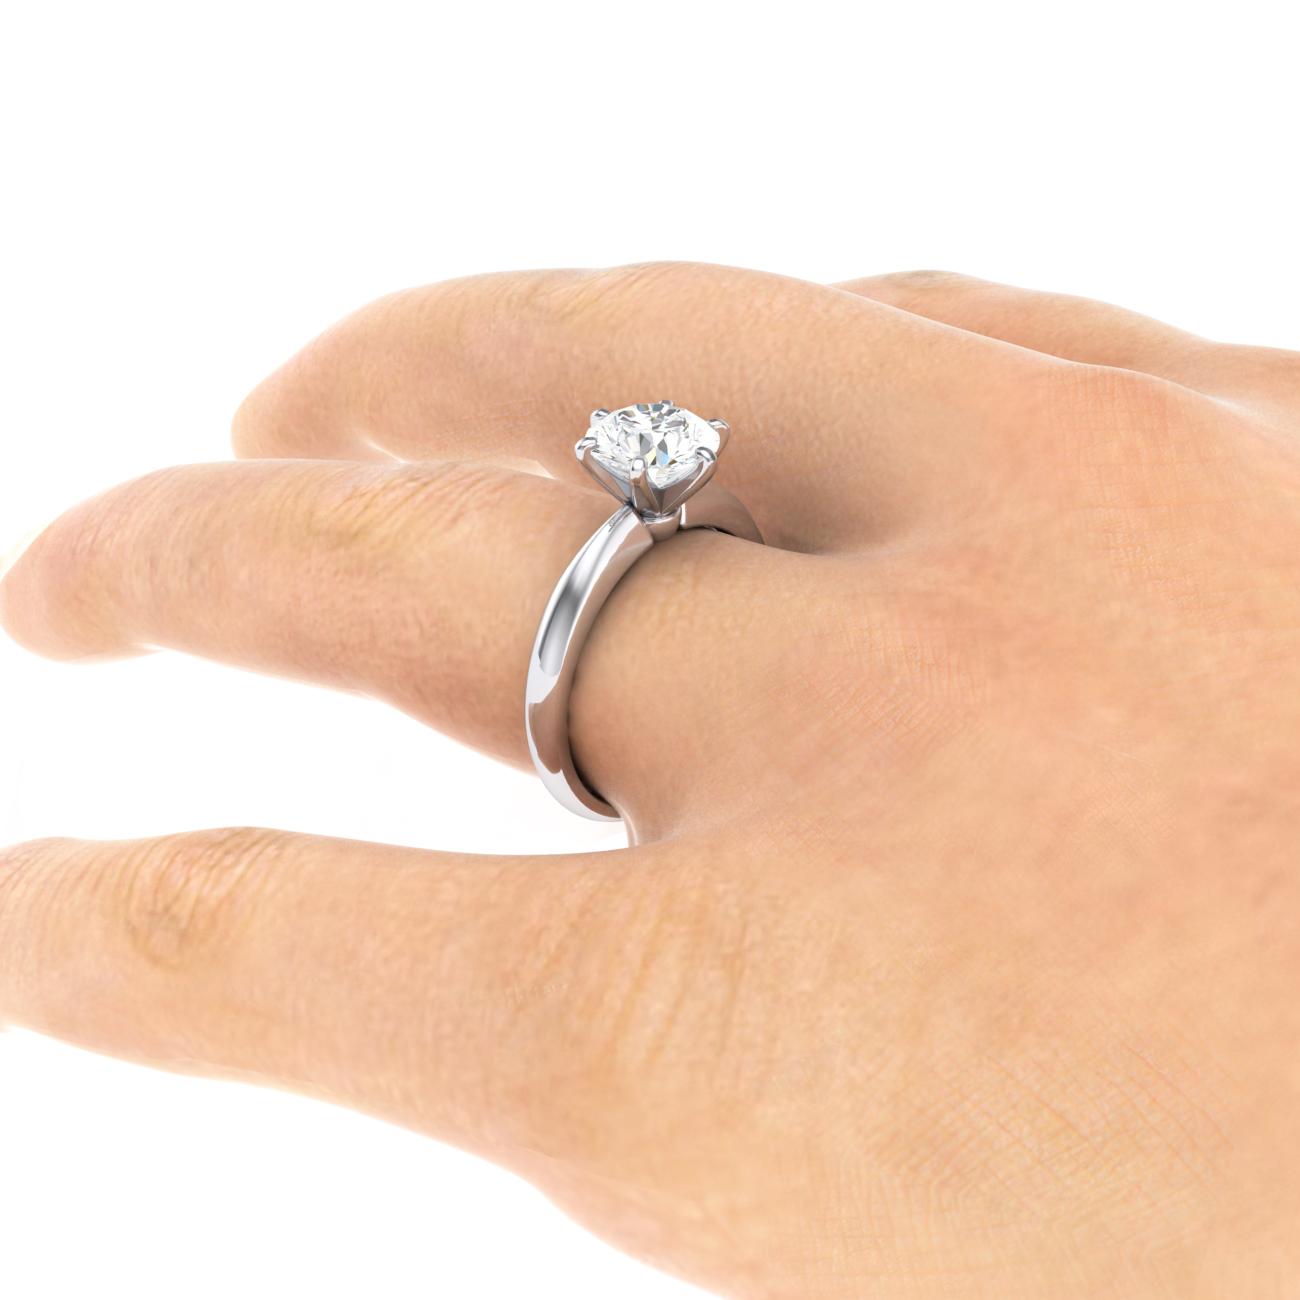 Engagement Ring Size Chart: Diamond engagement ring platinum dr101 handstill6 1300.jpg ,Chart